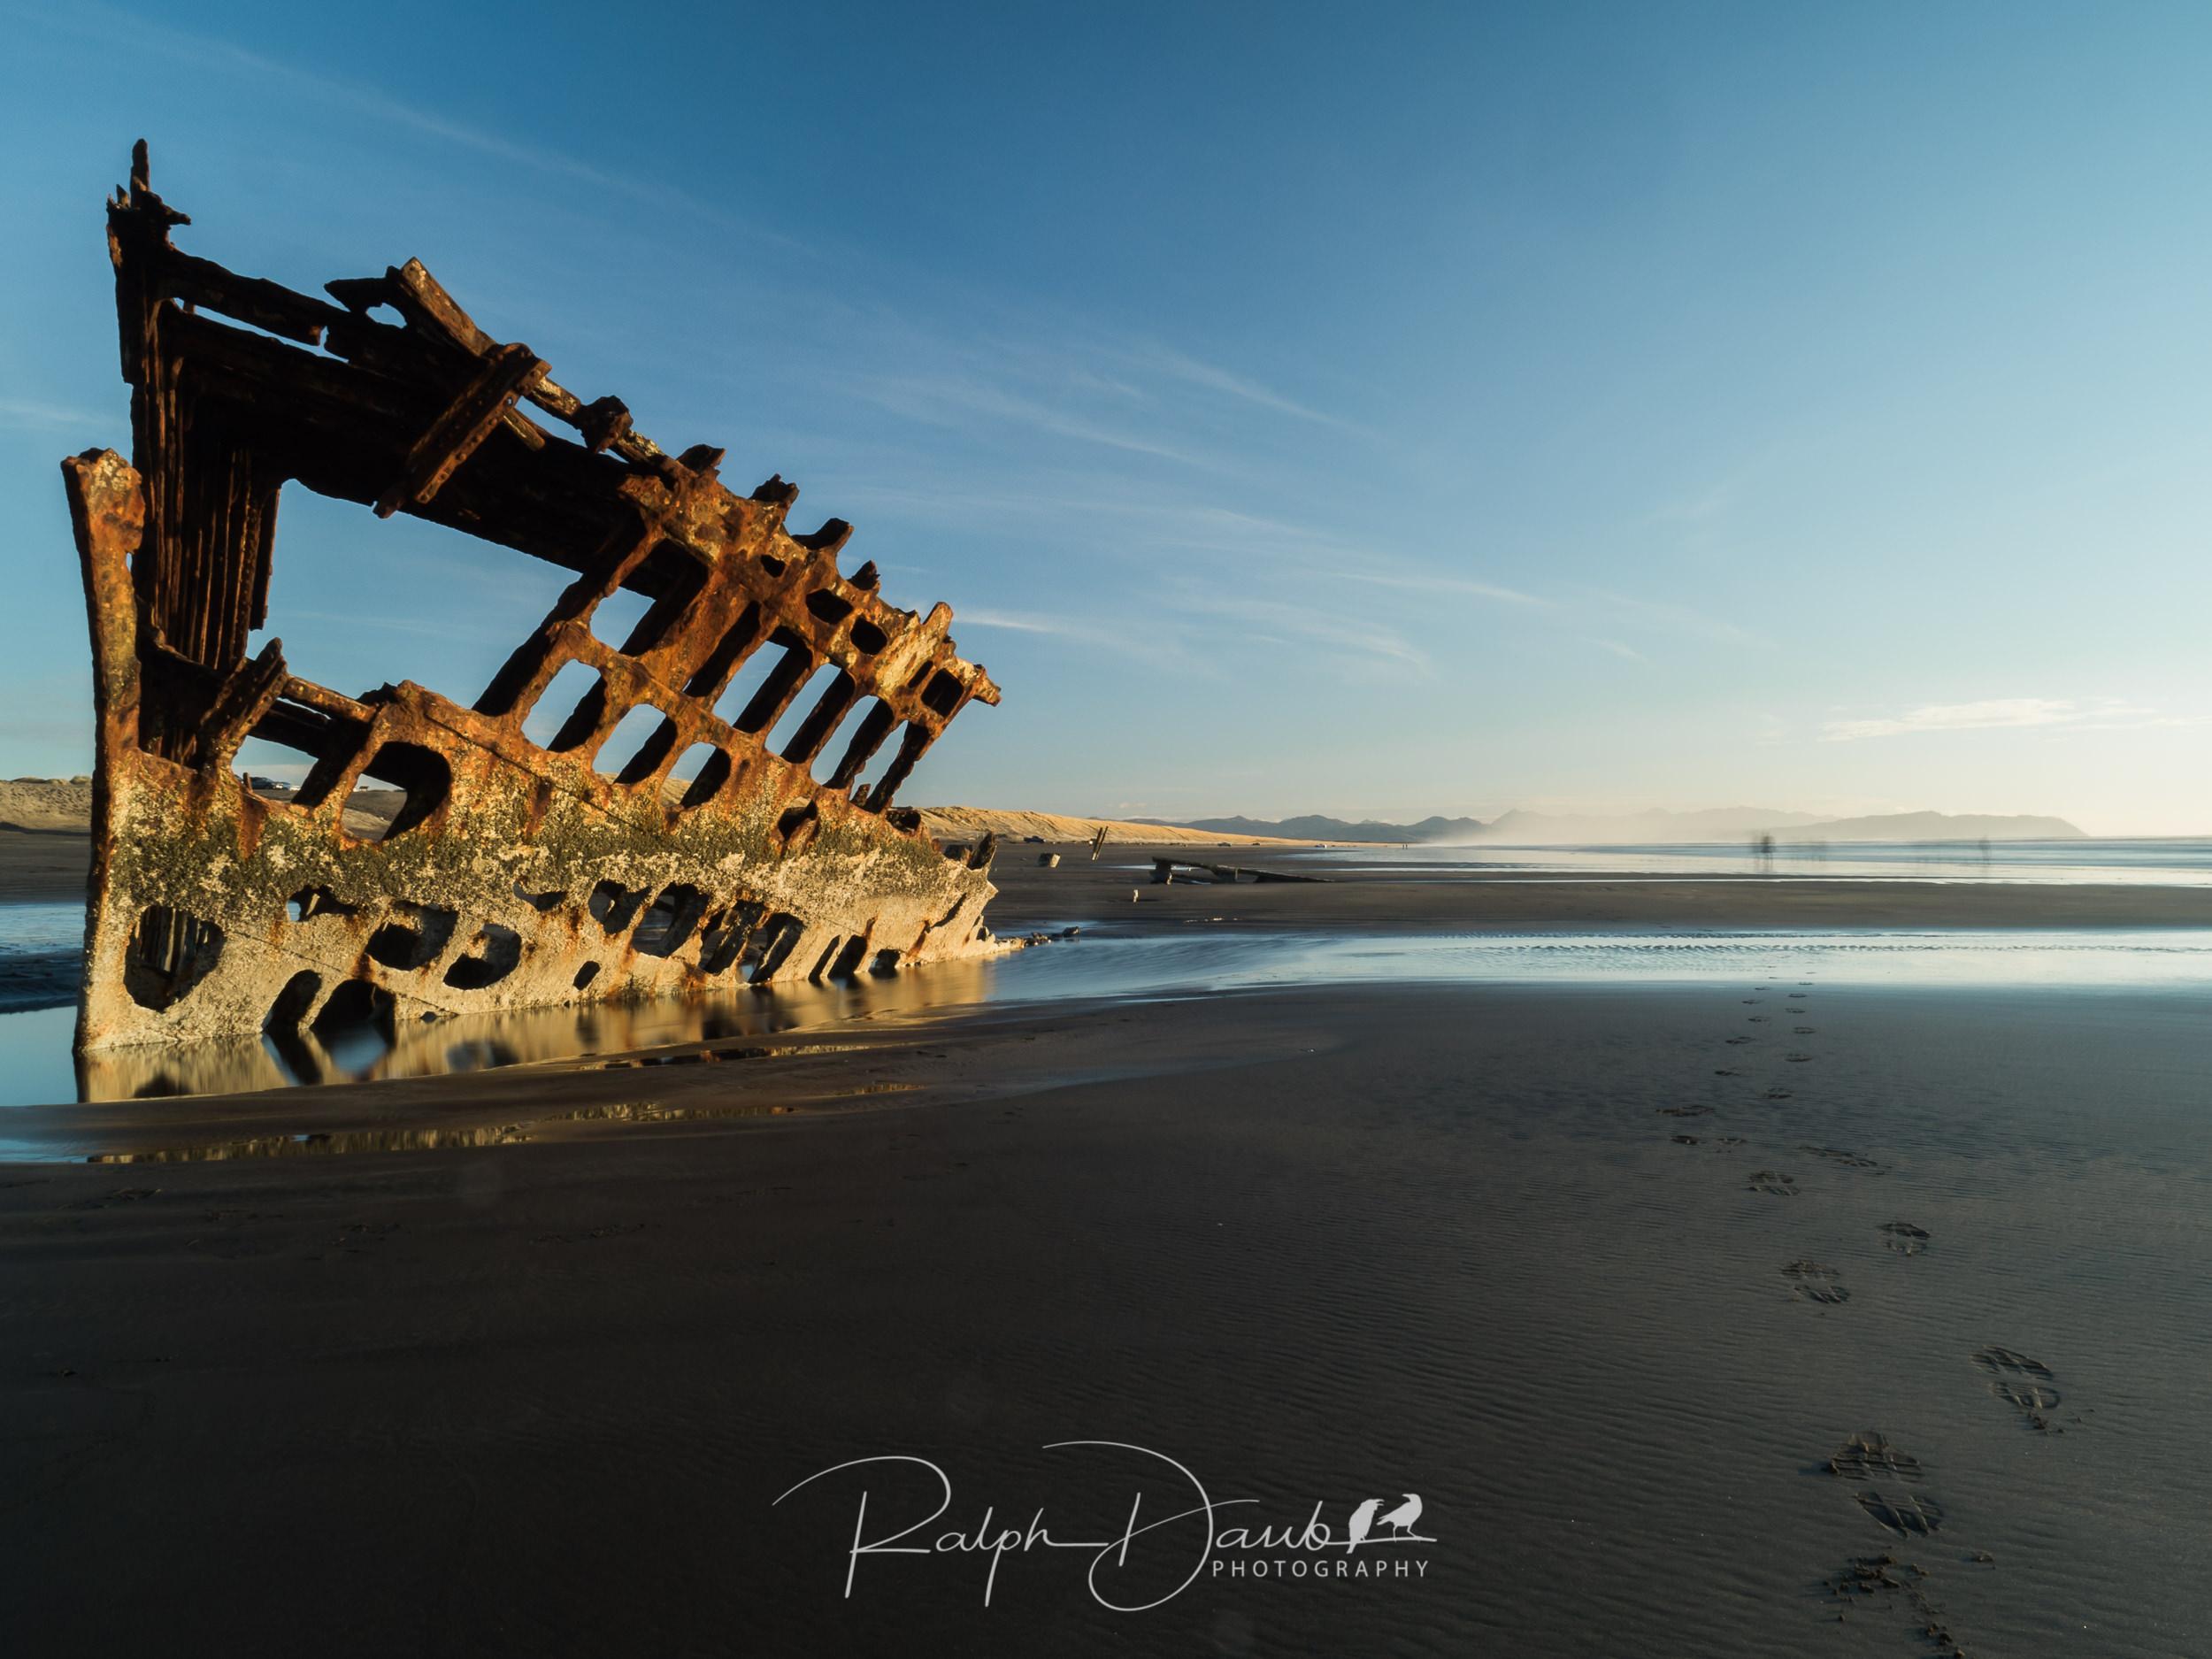 2017-12-04 - Peter Iredale Shipwreck - 16h47m.jpg